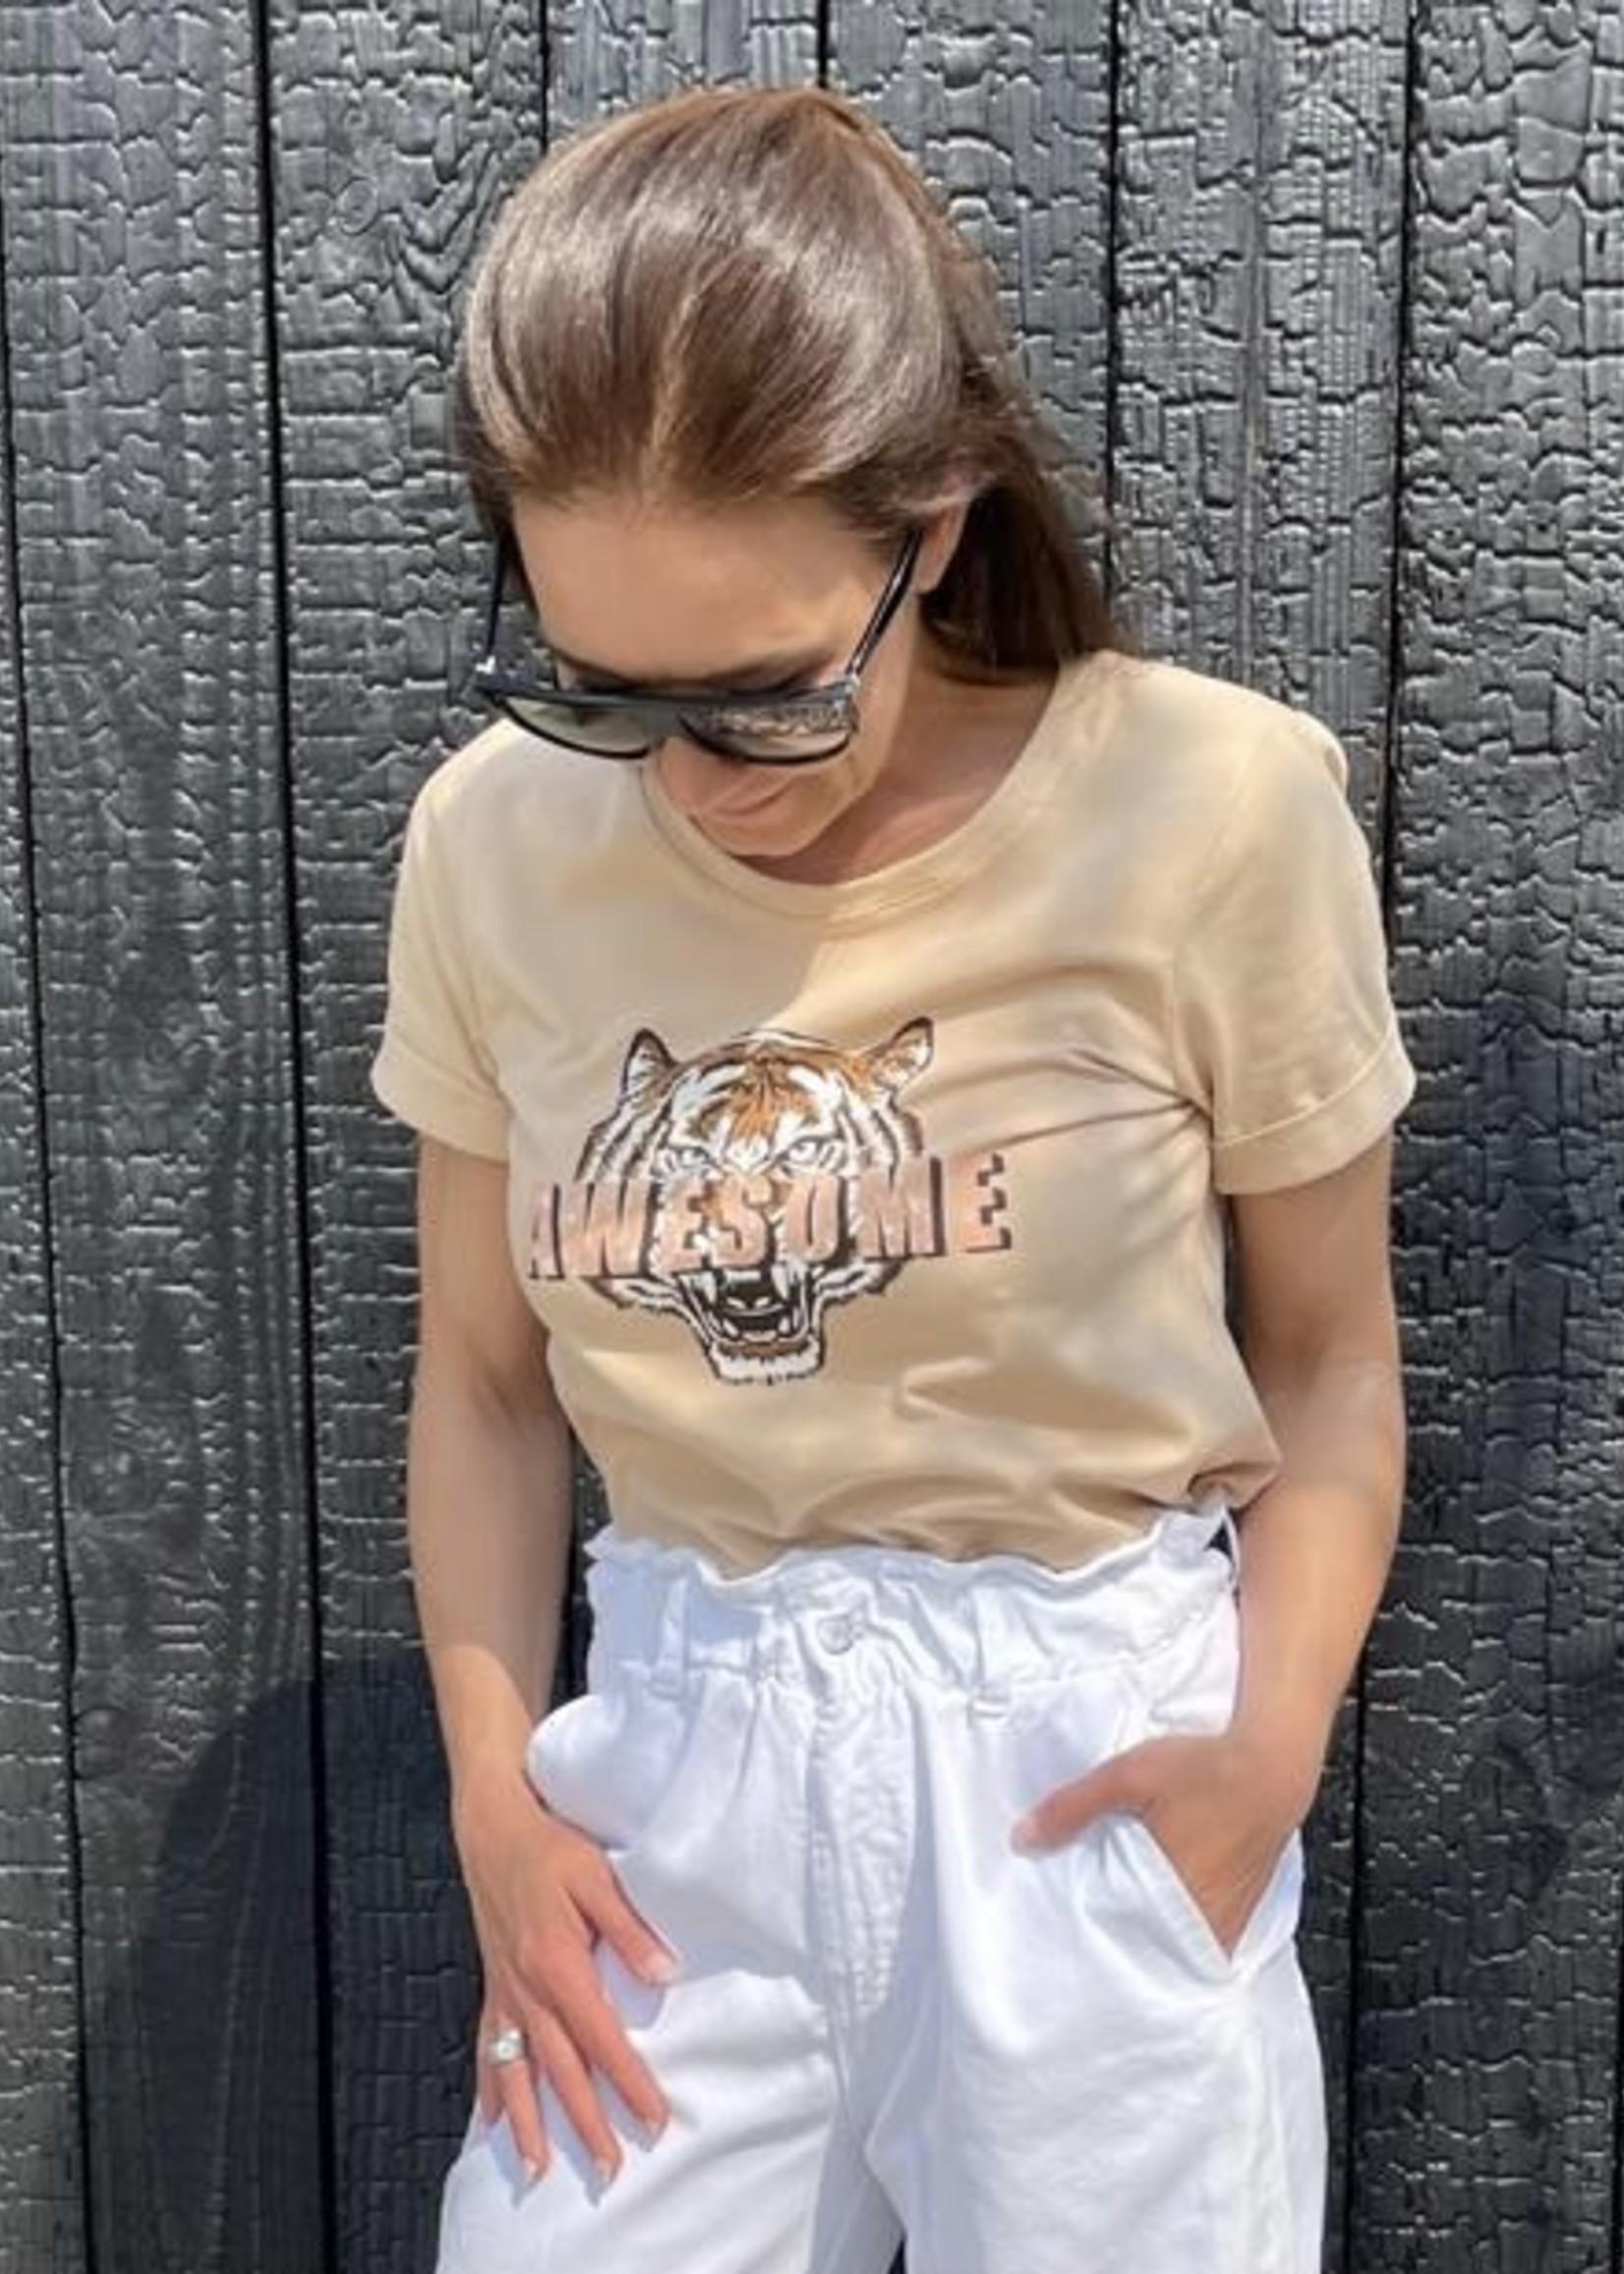 Guts & Goats Awesome Shirt